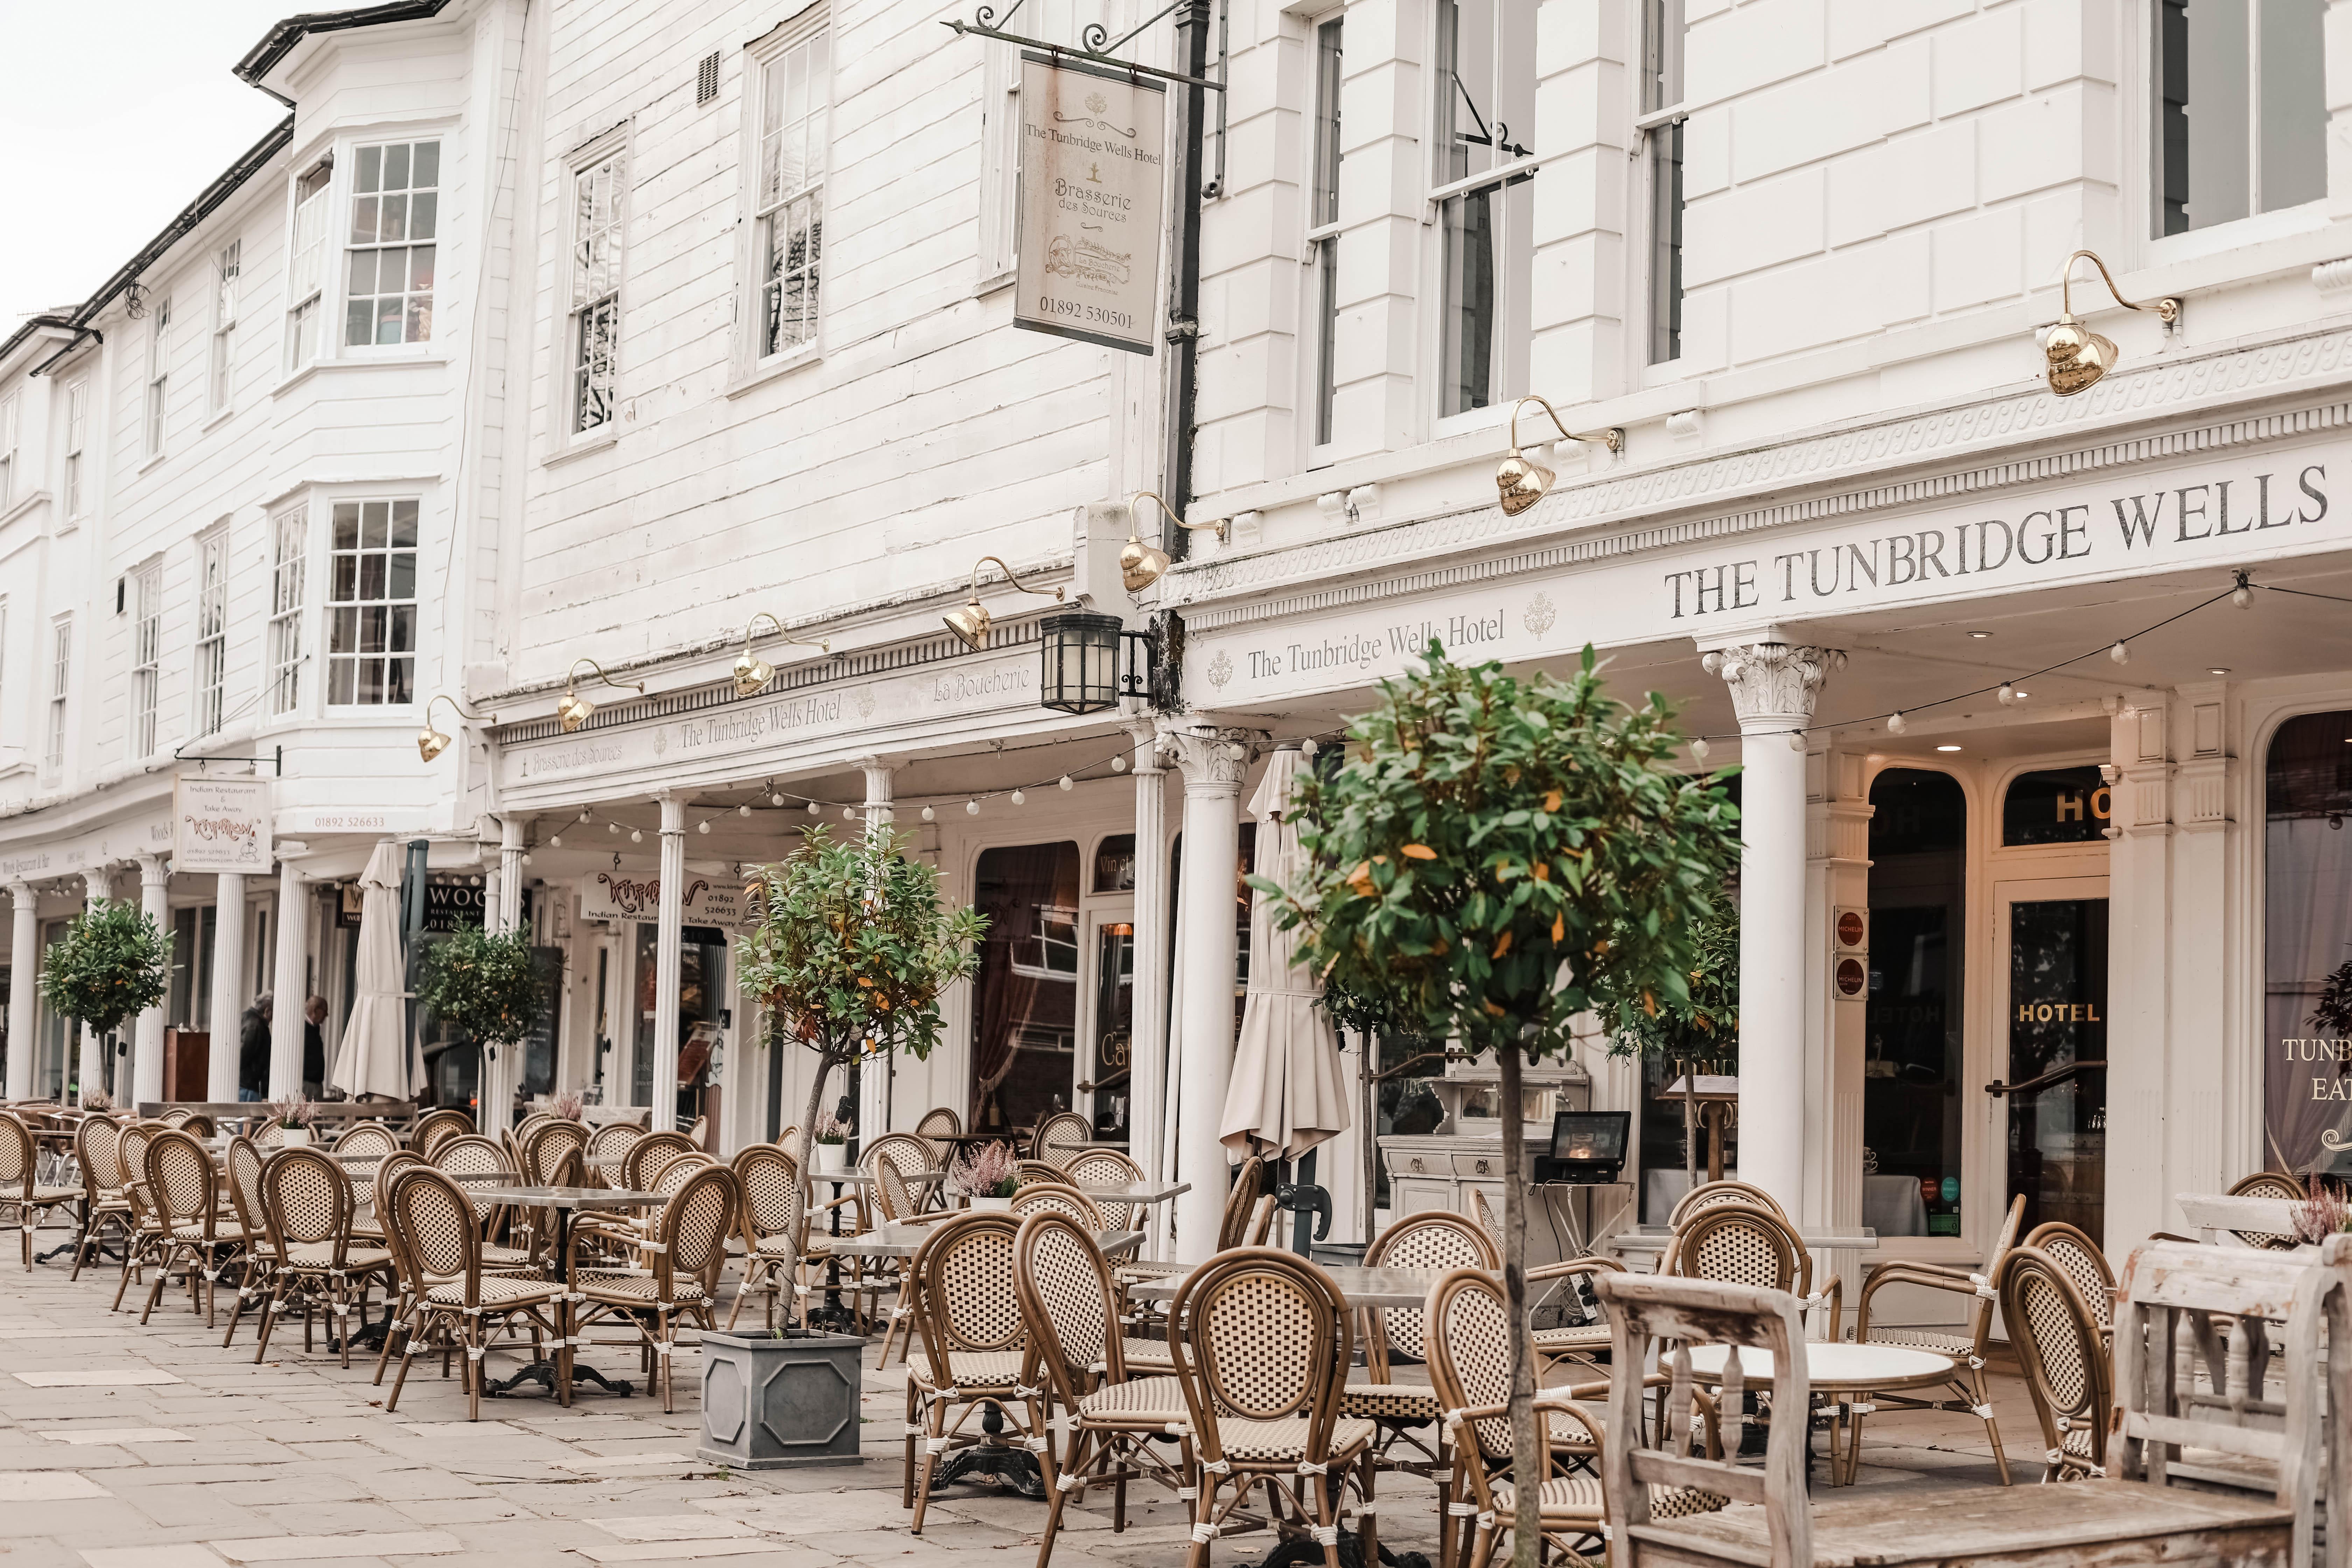 Cake Decorations Tunbridge Wells : Discovering Hidden Gems in Tunbridge Wells - Fashion Mumblr